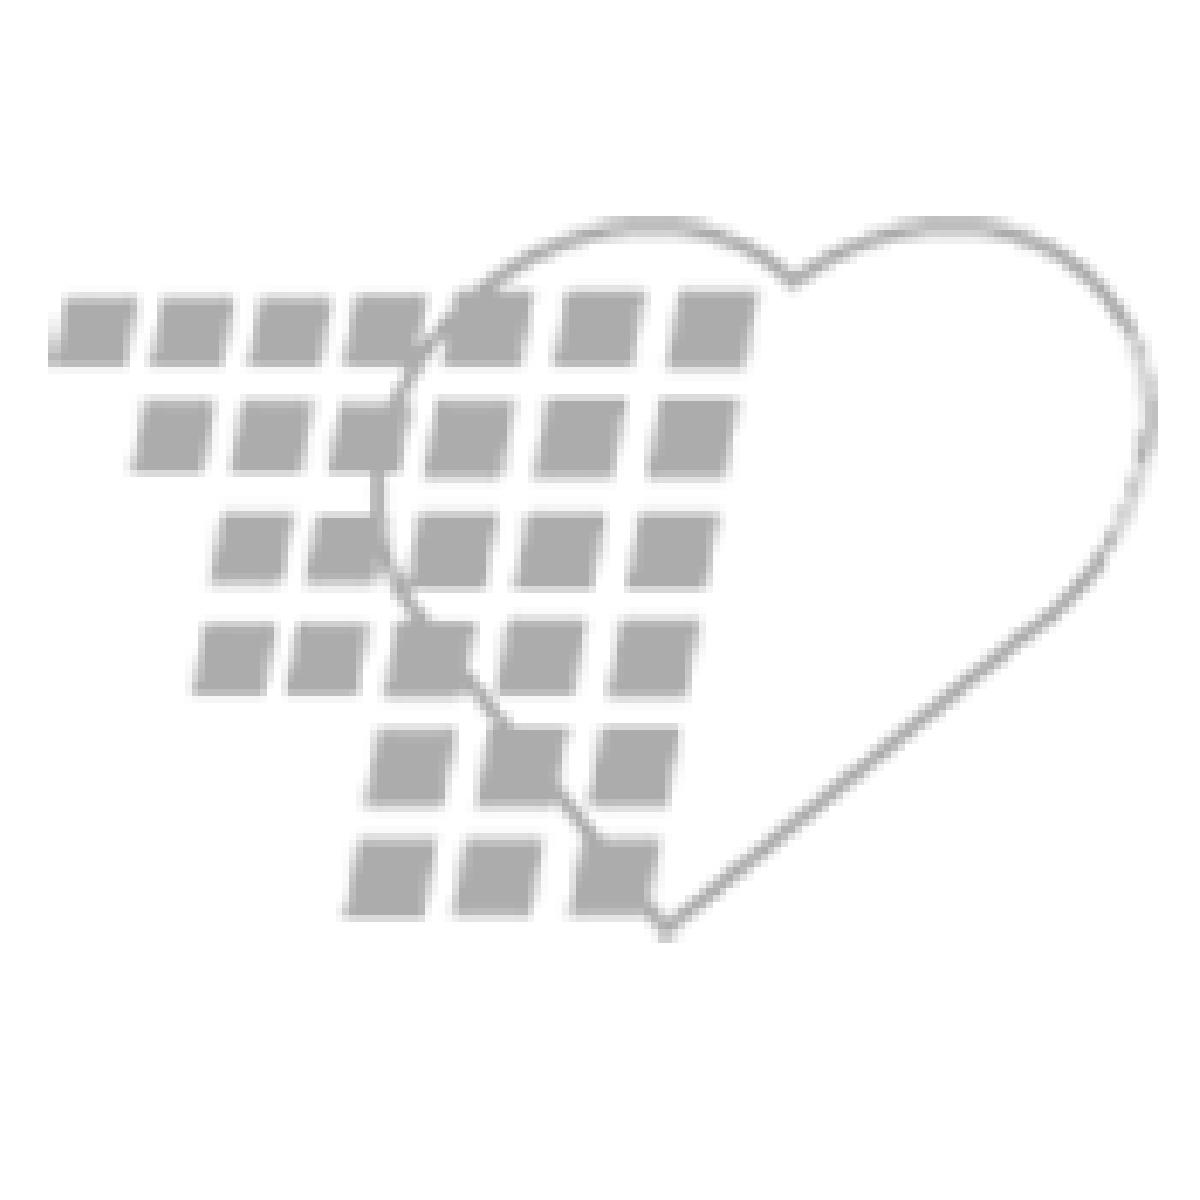 06-99-0408 Chester Chest™ PICC Line